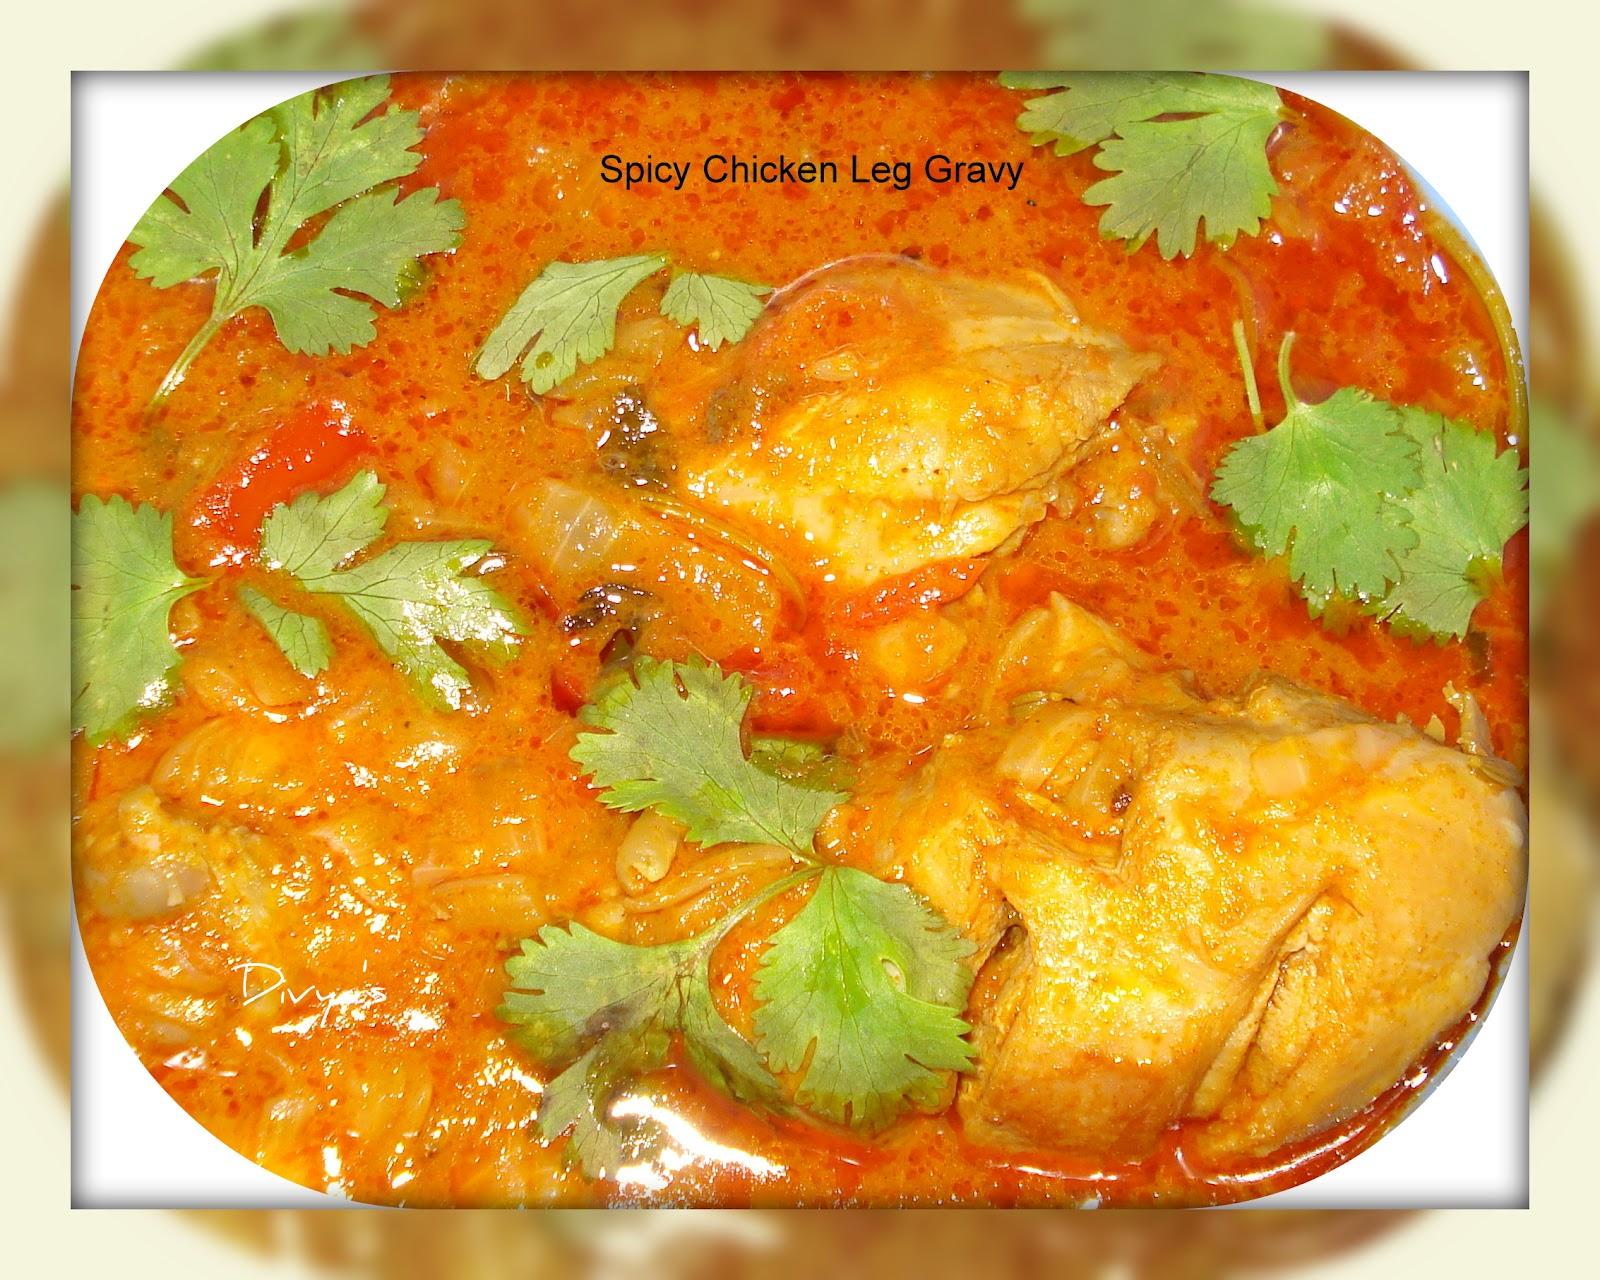 http://1.bp.blogspot.com/-9JgBYsF_MaQ/T18-Je7Vl4I/AAAAAAAAASE/9B5idmprek0/s1600/spicy_Chicken_leg_masala.JPG